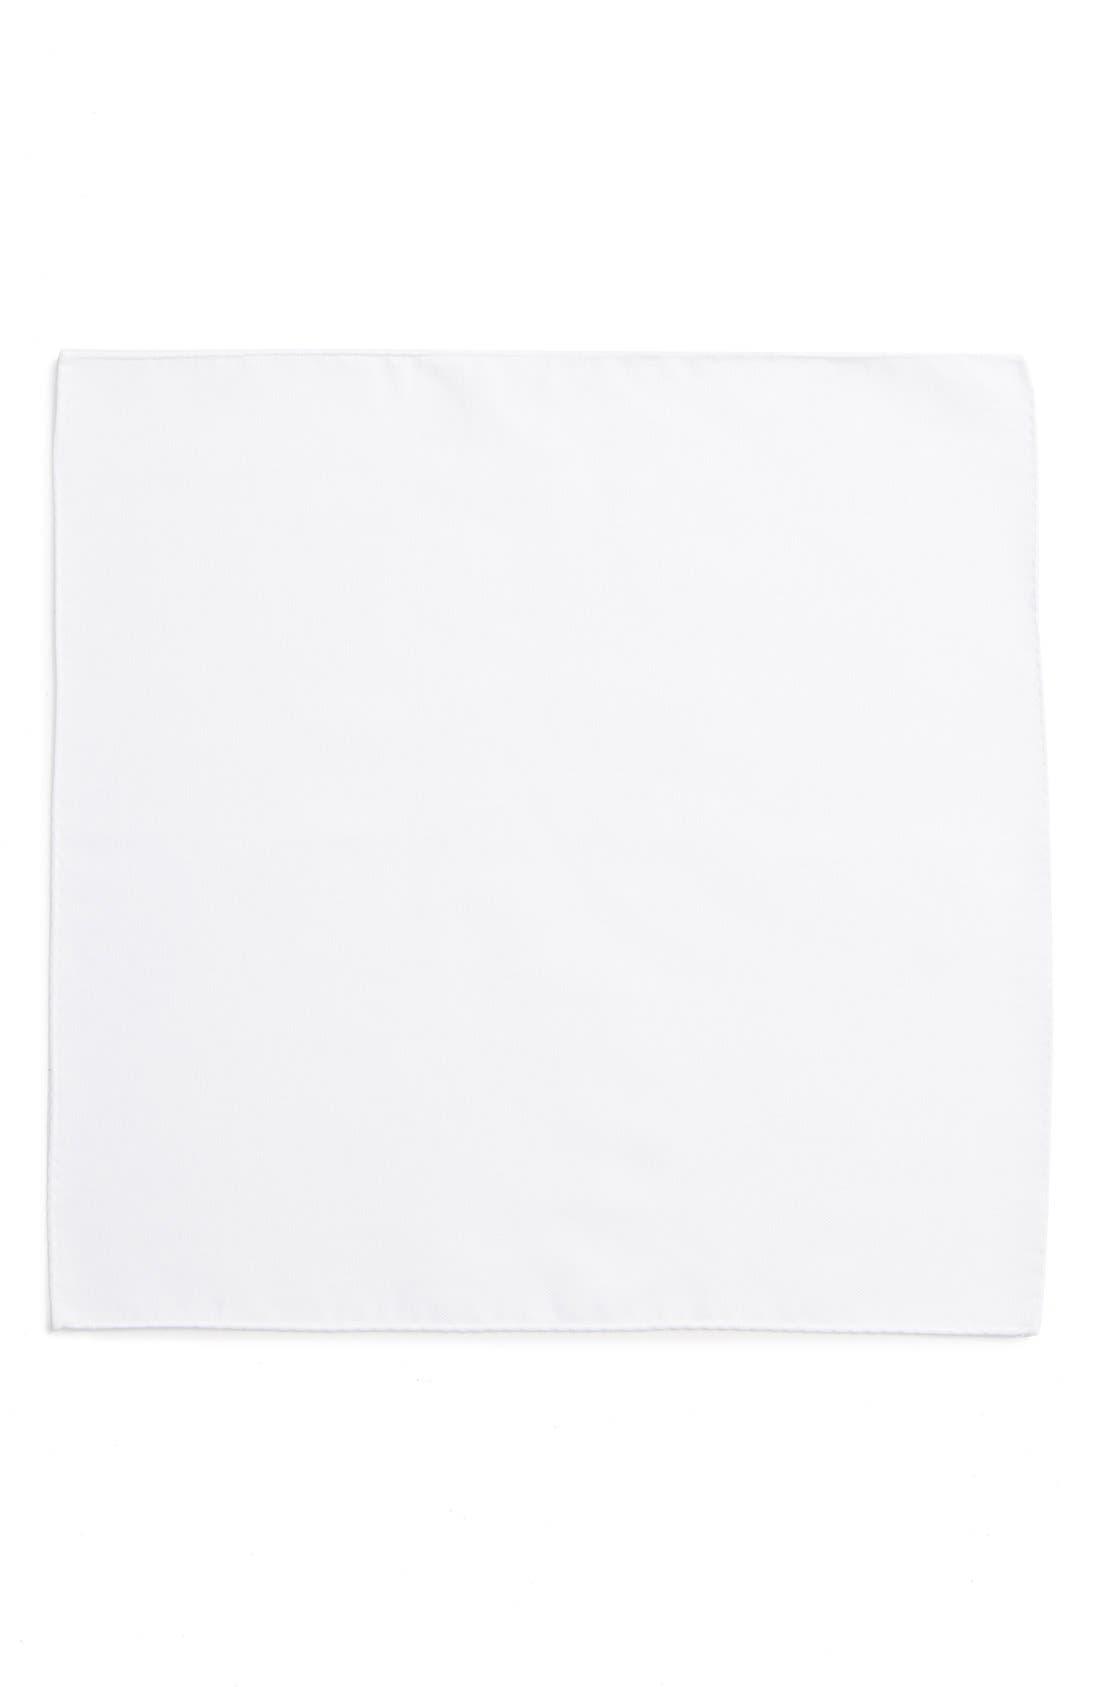 TED BAKER LONDON,                             Solid Cotton Pocket Square,                             Alternate thumbnail 2, color,                             WHITE